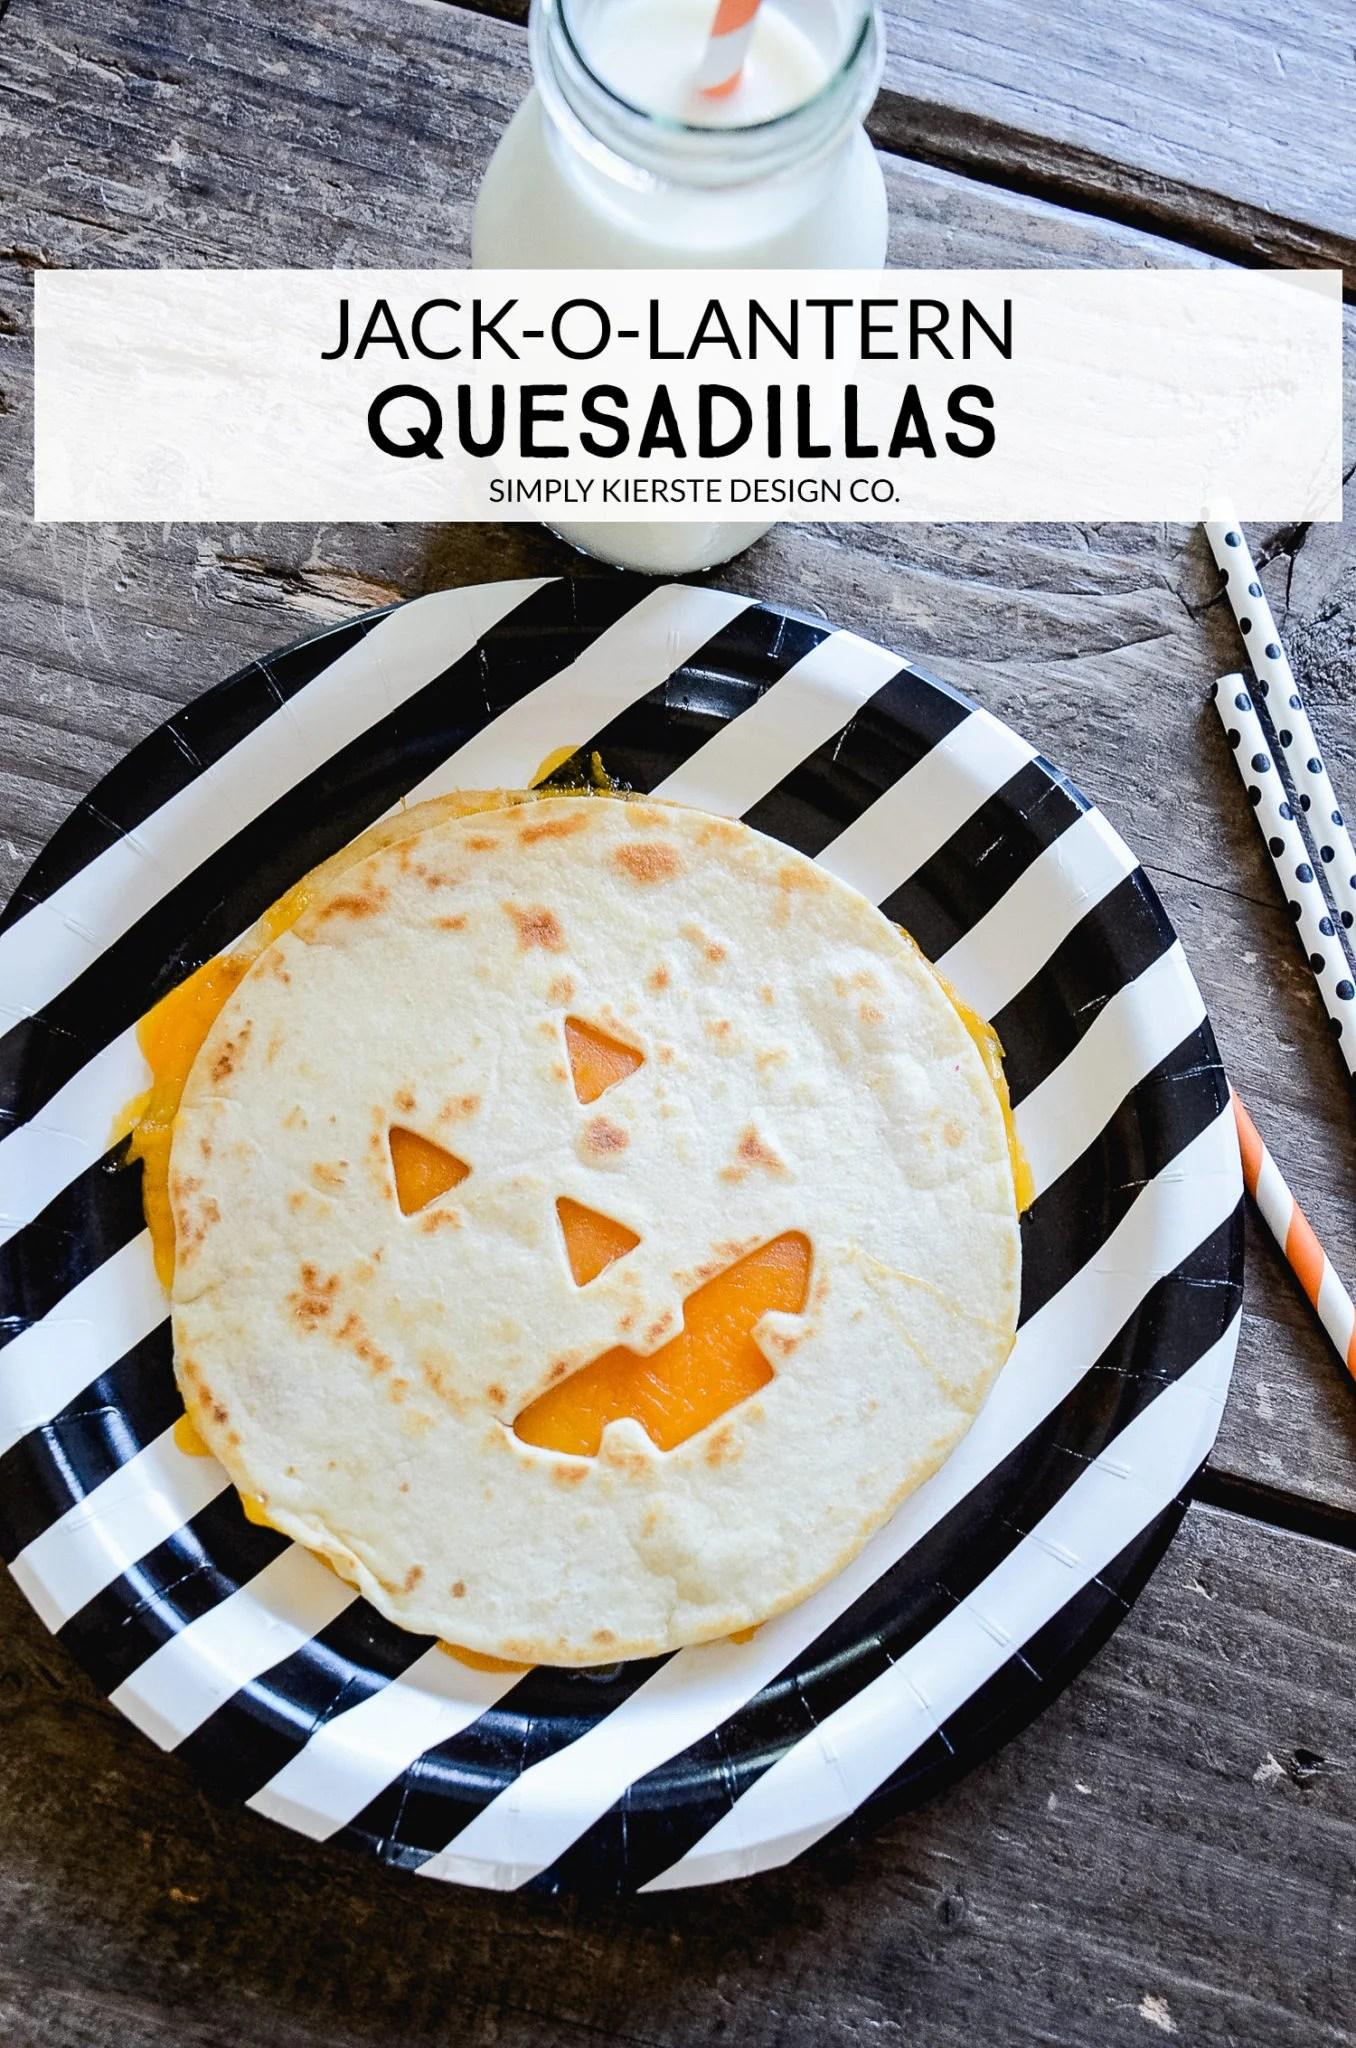 Jack-o-lantern Quesadillas   Easy Halloween Ideas   Halloween Dinner Ideas   oldsaltfarm.com